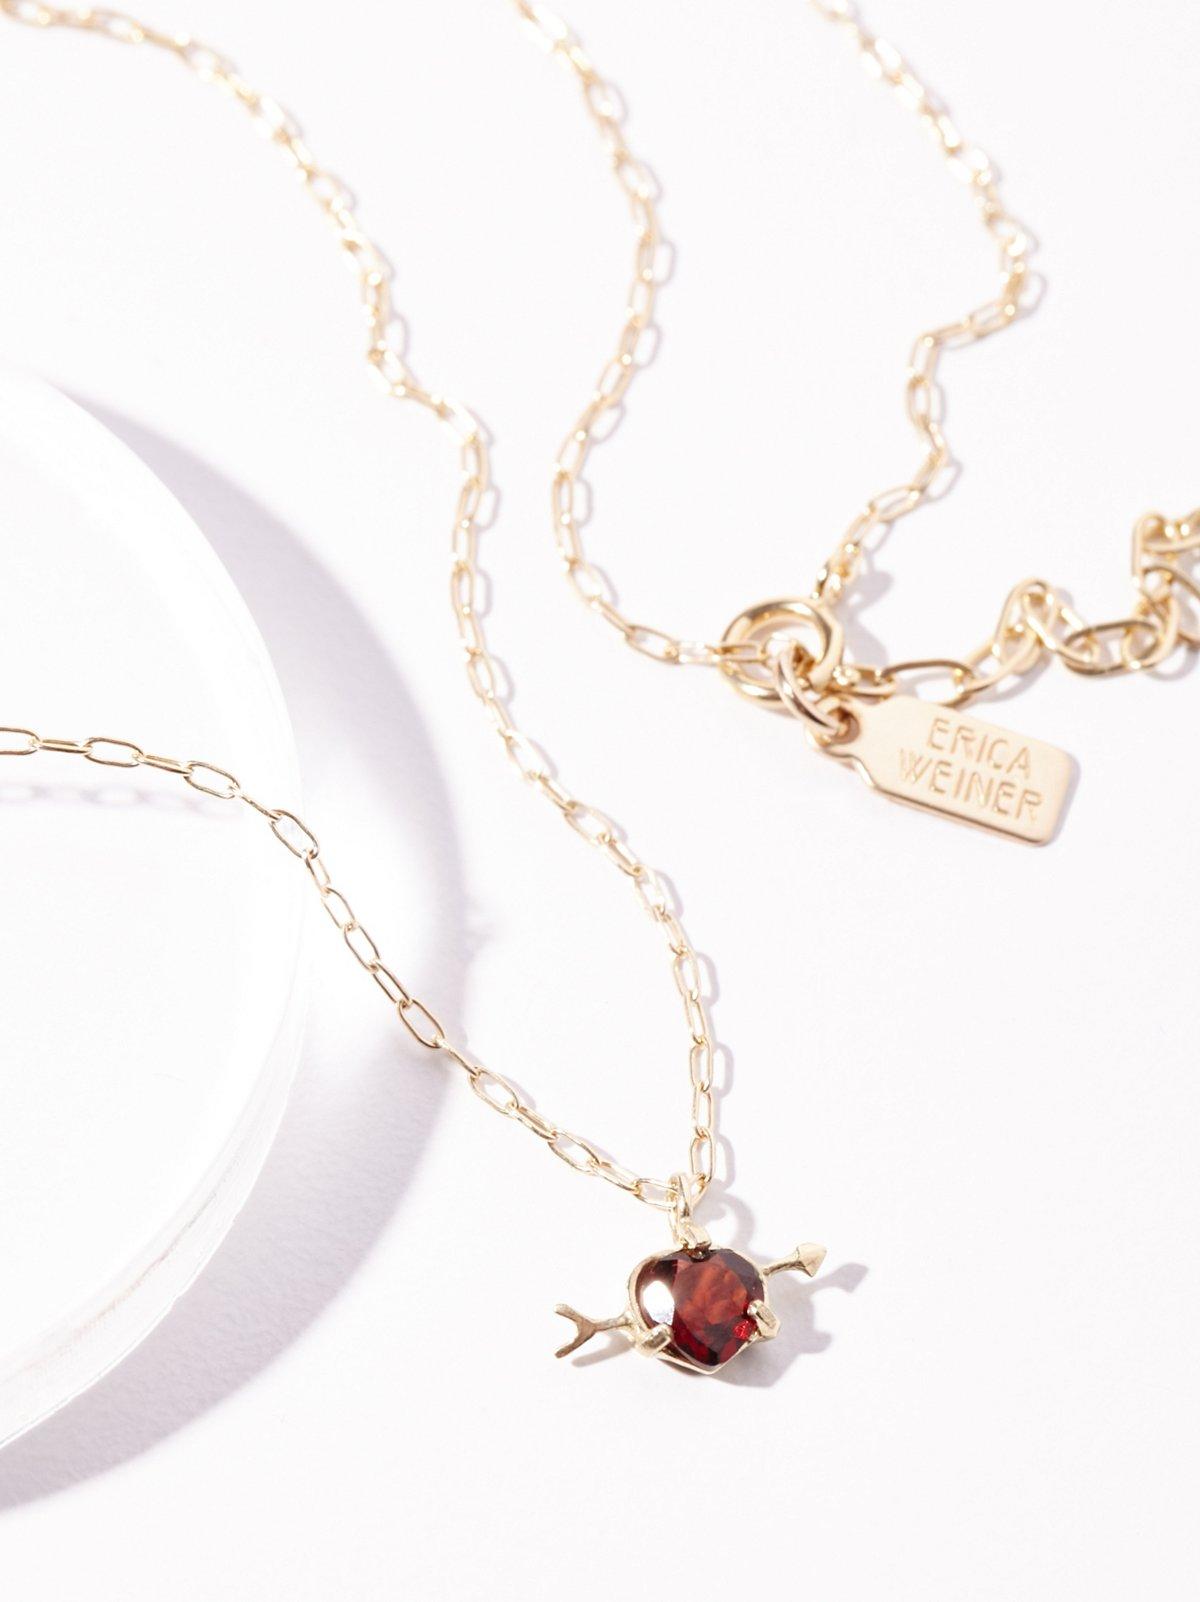 10k Cupids Heart Necklace